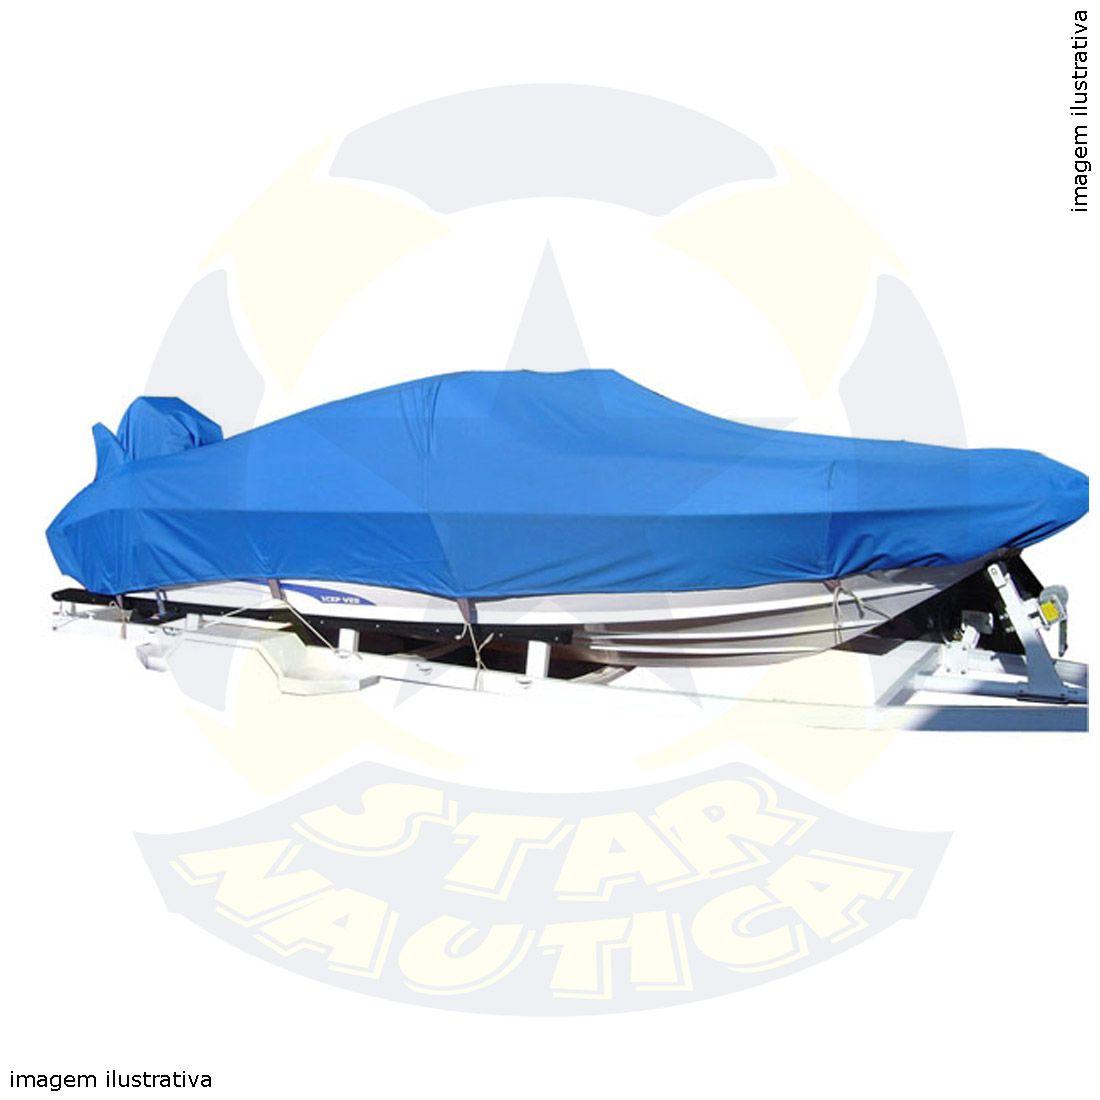 Capa Lona de Cobertura Lancha Focker 190 Lona Vinílica